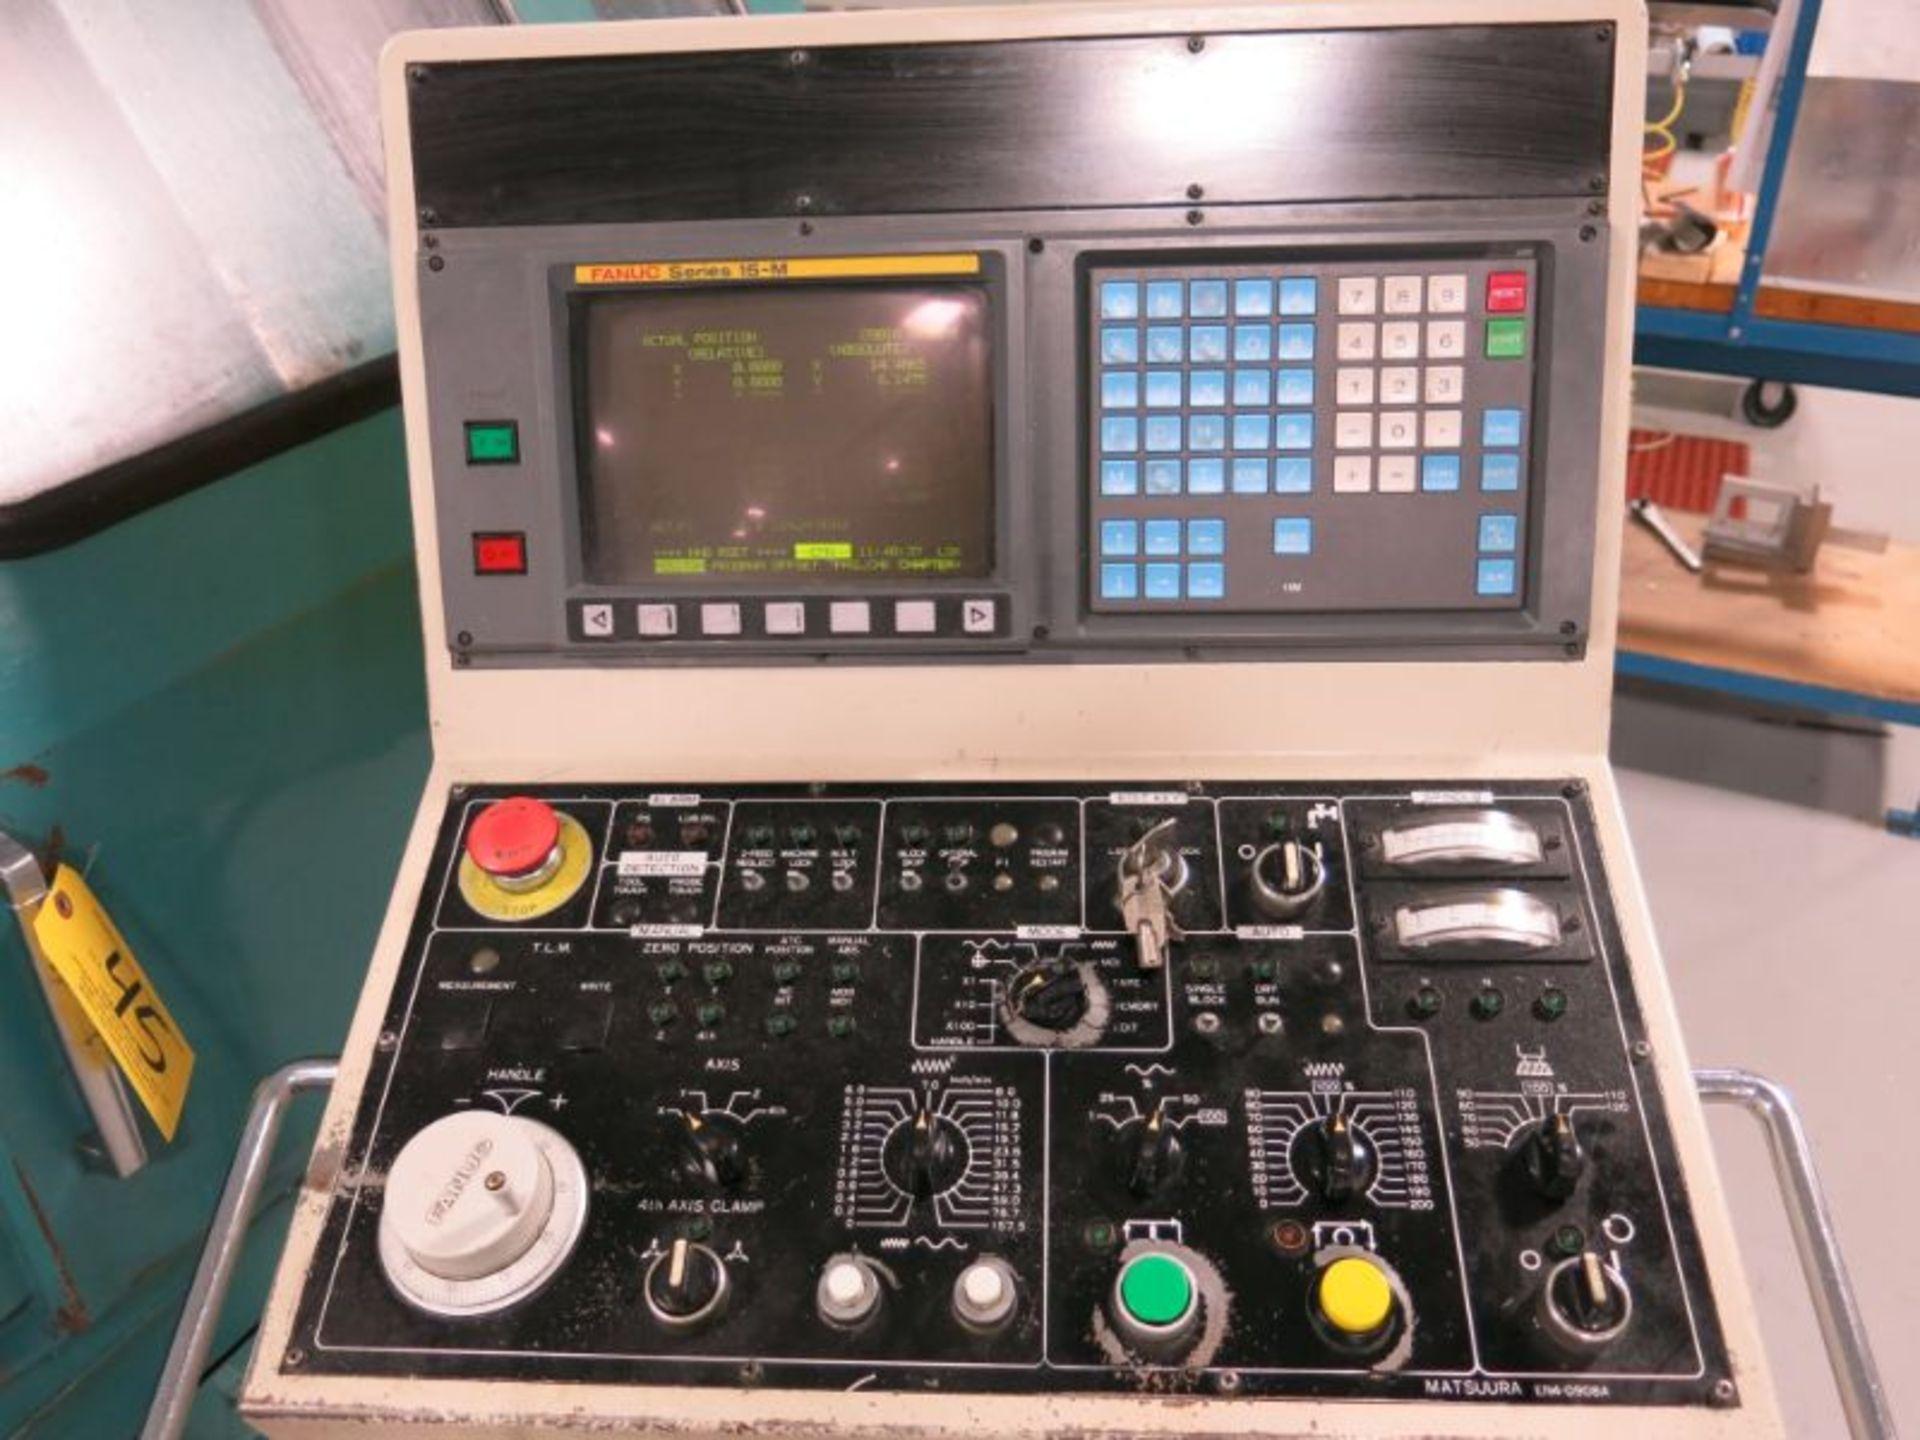 1991 Matsuura MC-760VX-DC Twin Spindle CNC VMC - Image 4 of 5